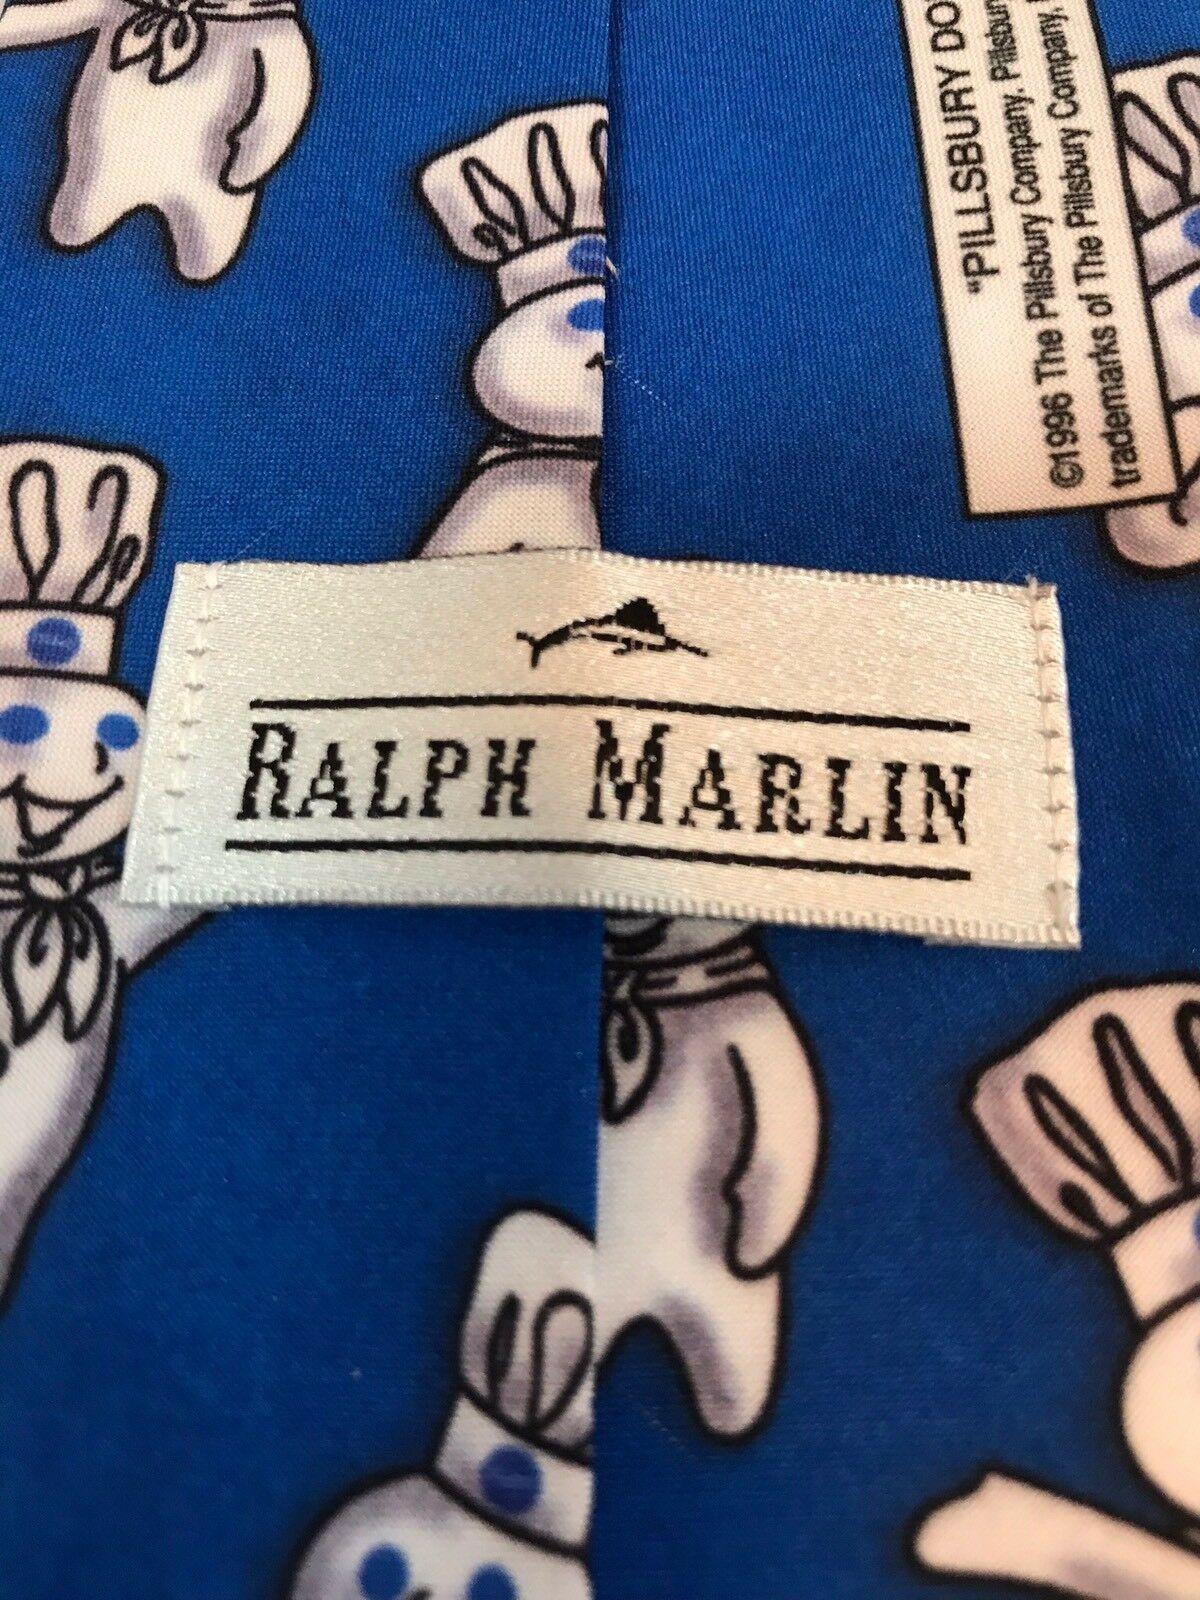 Pillsbury Dough Boy Repeat Ralph Marlin Blue Classic Men's Neck Tie 1996 image 3